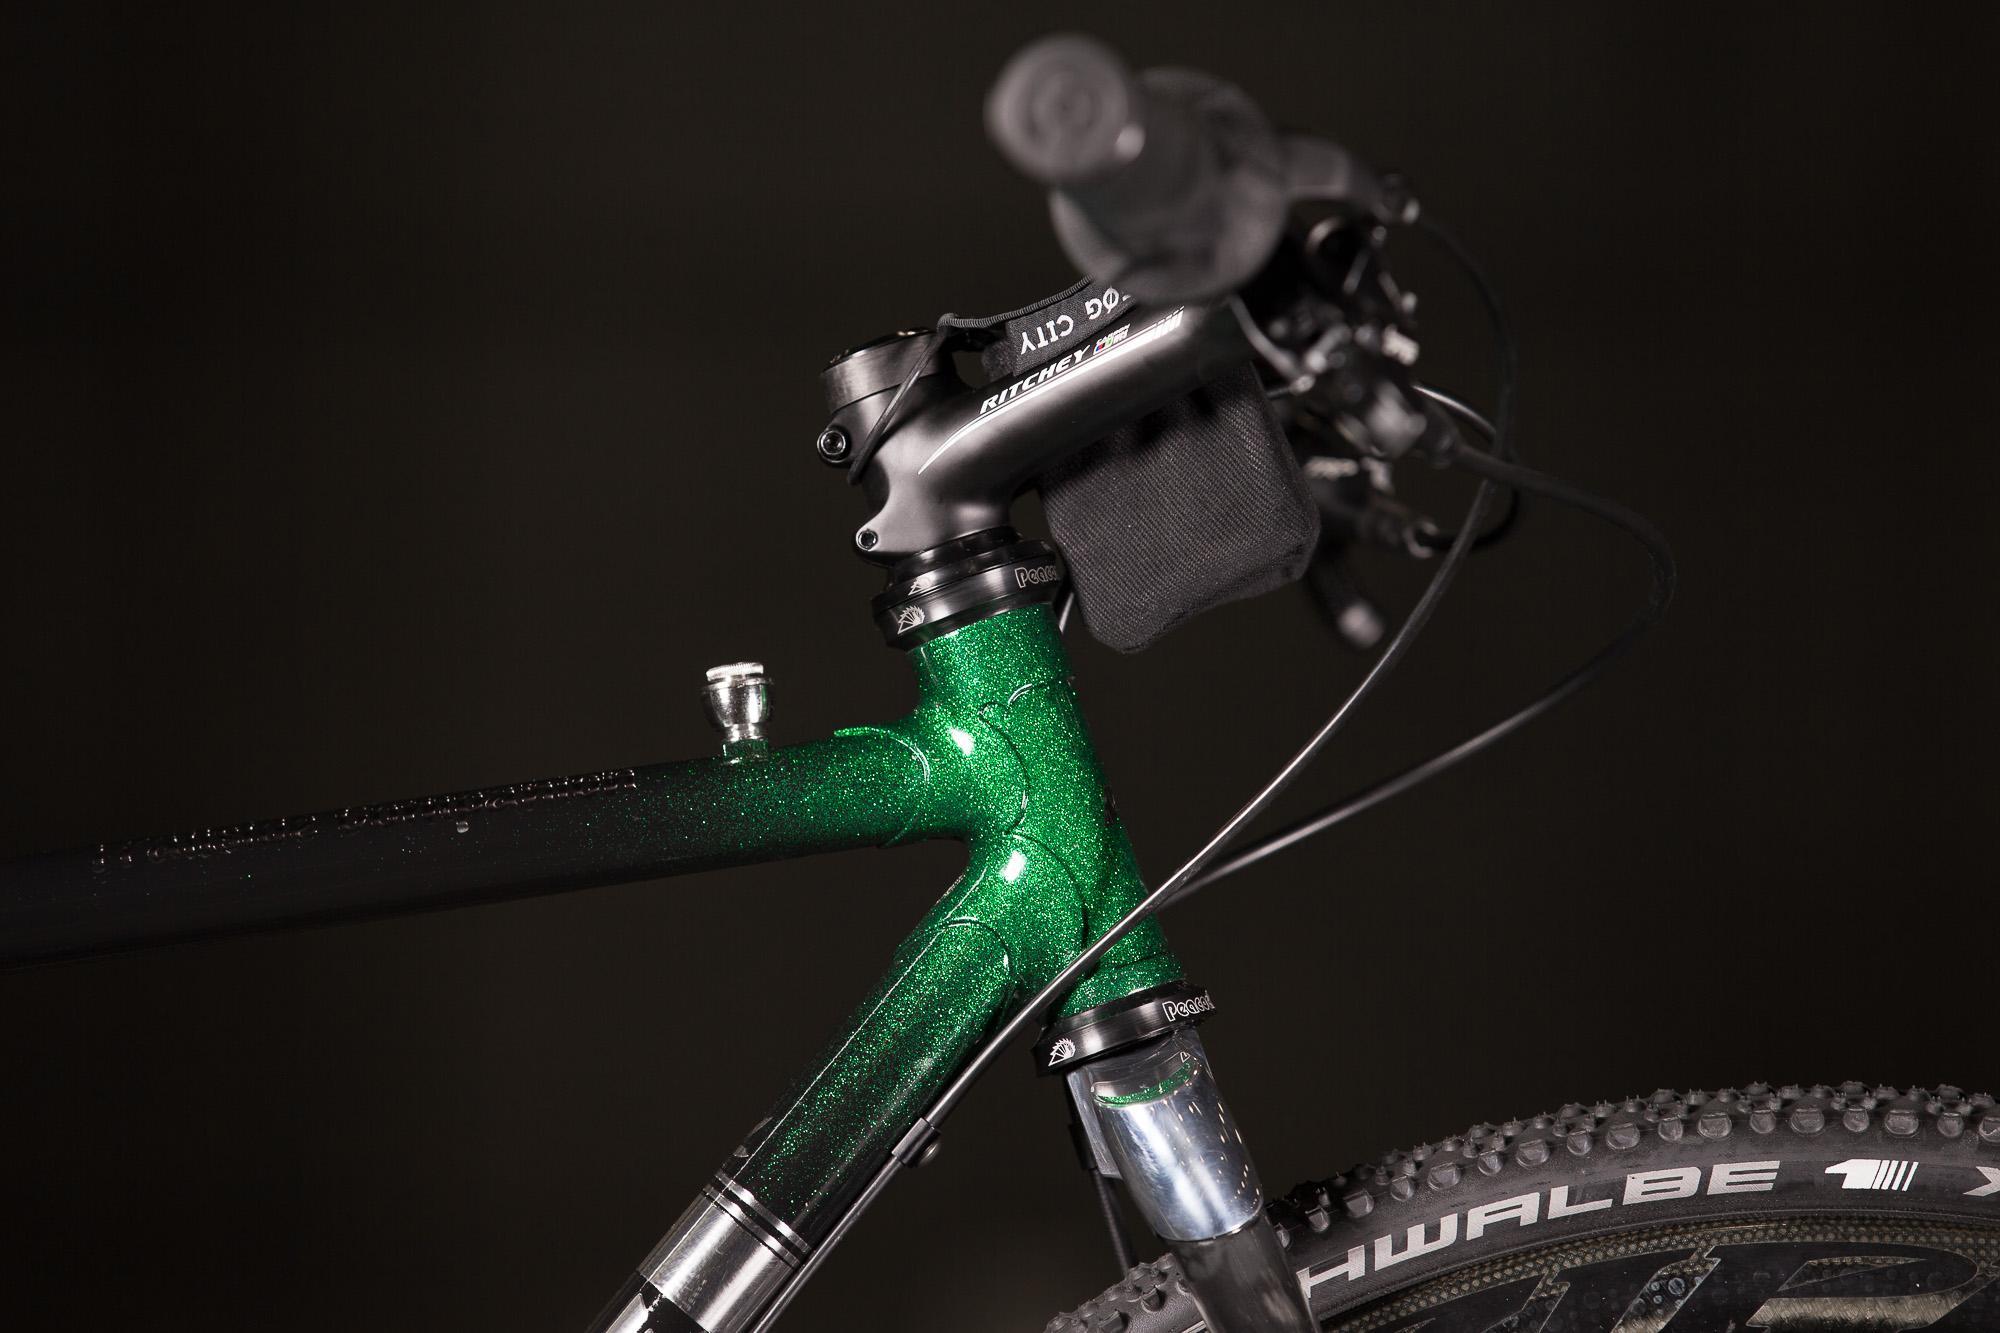 2016 NAHBS: Mars Cycles Trailside Companion 'Cross Bike